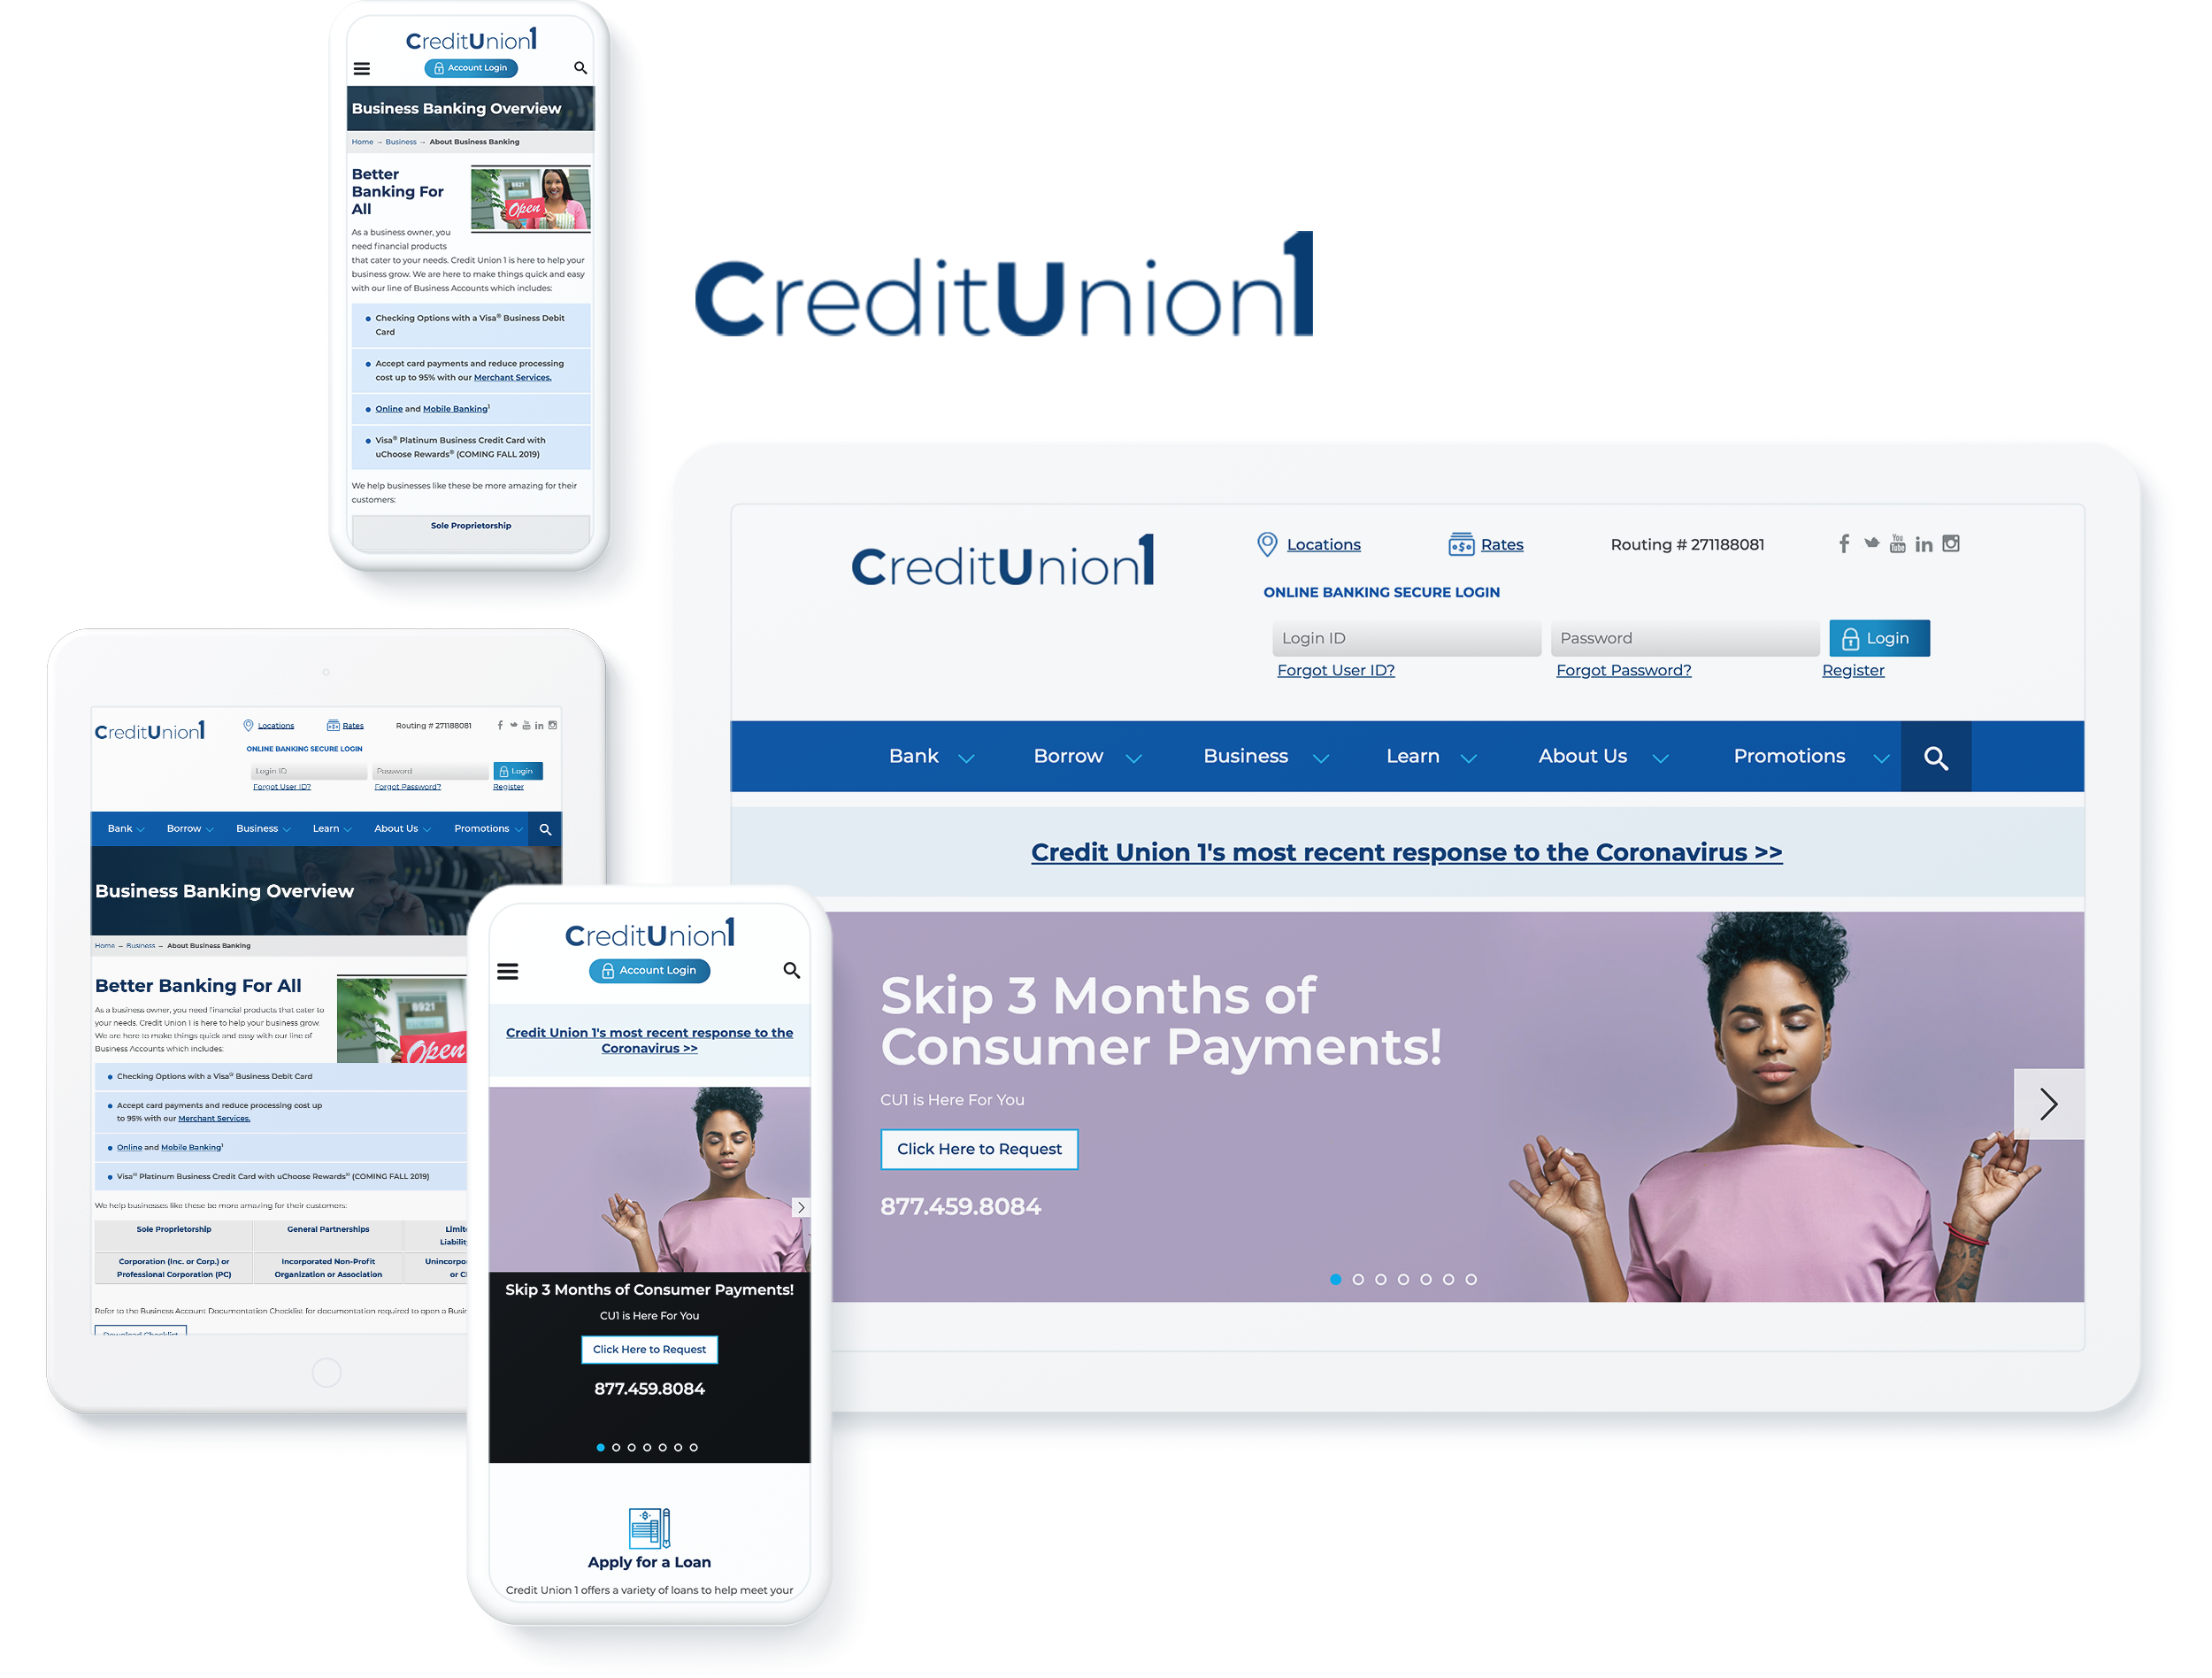 creditunion1 spotlight